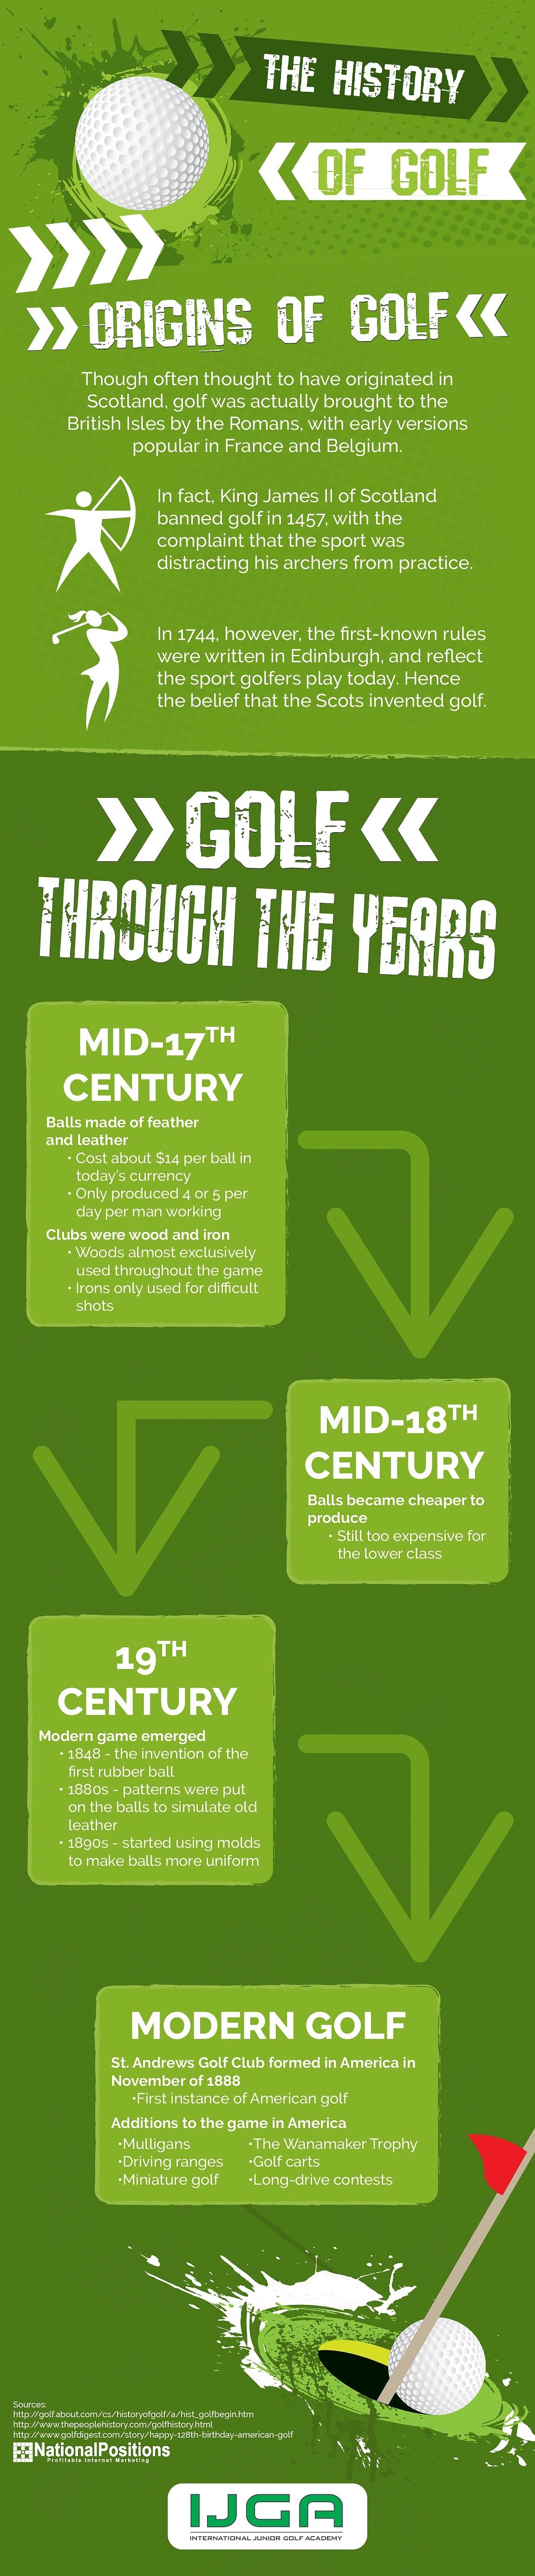 a look at golf's history